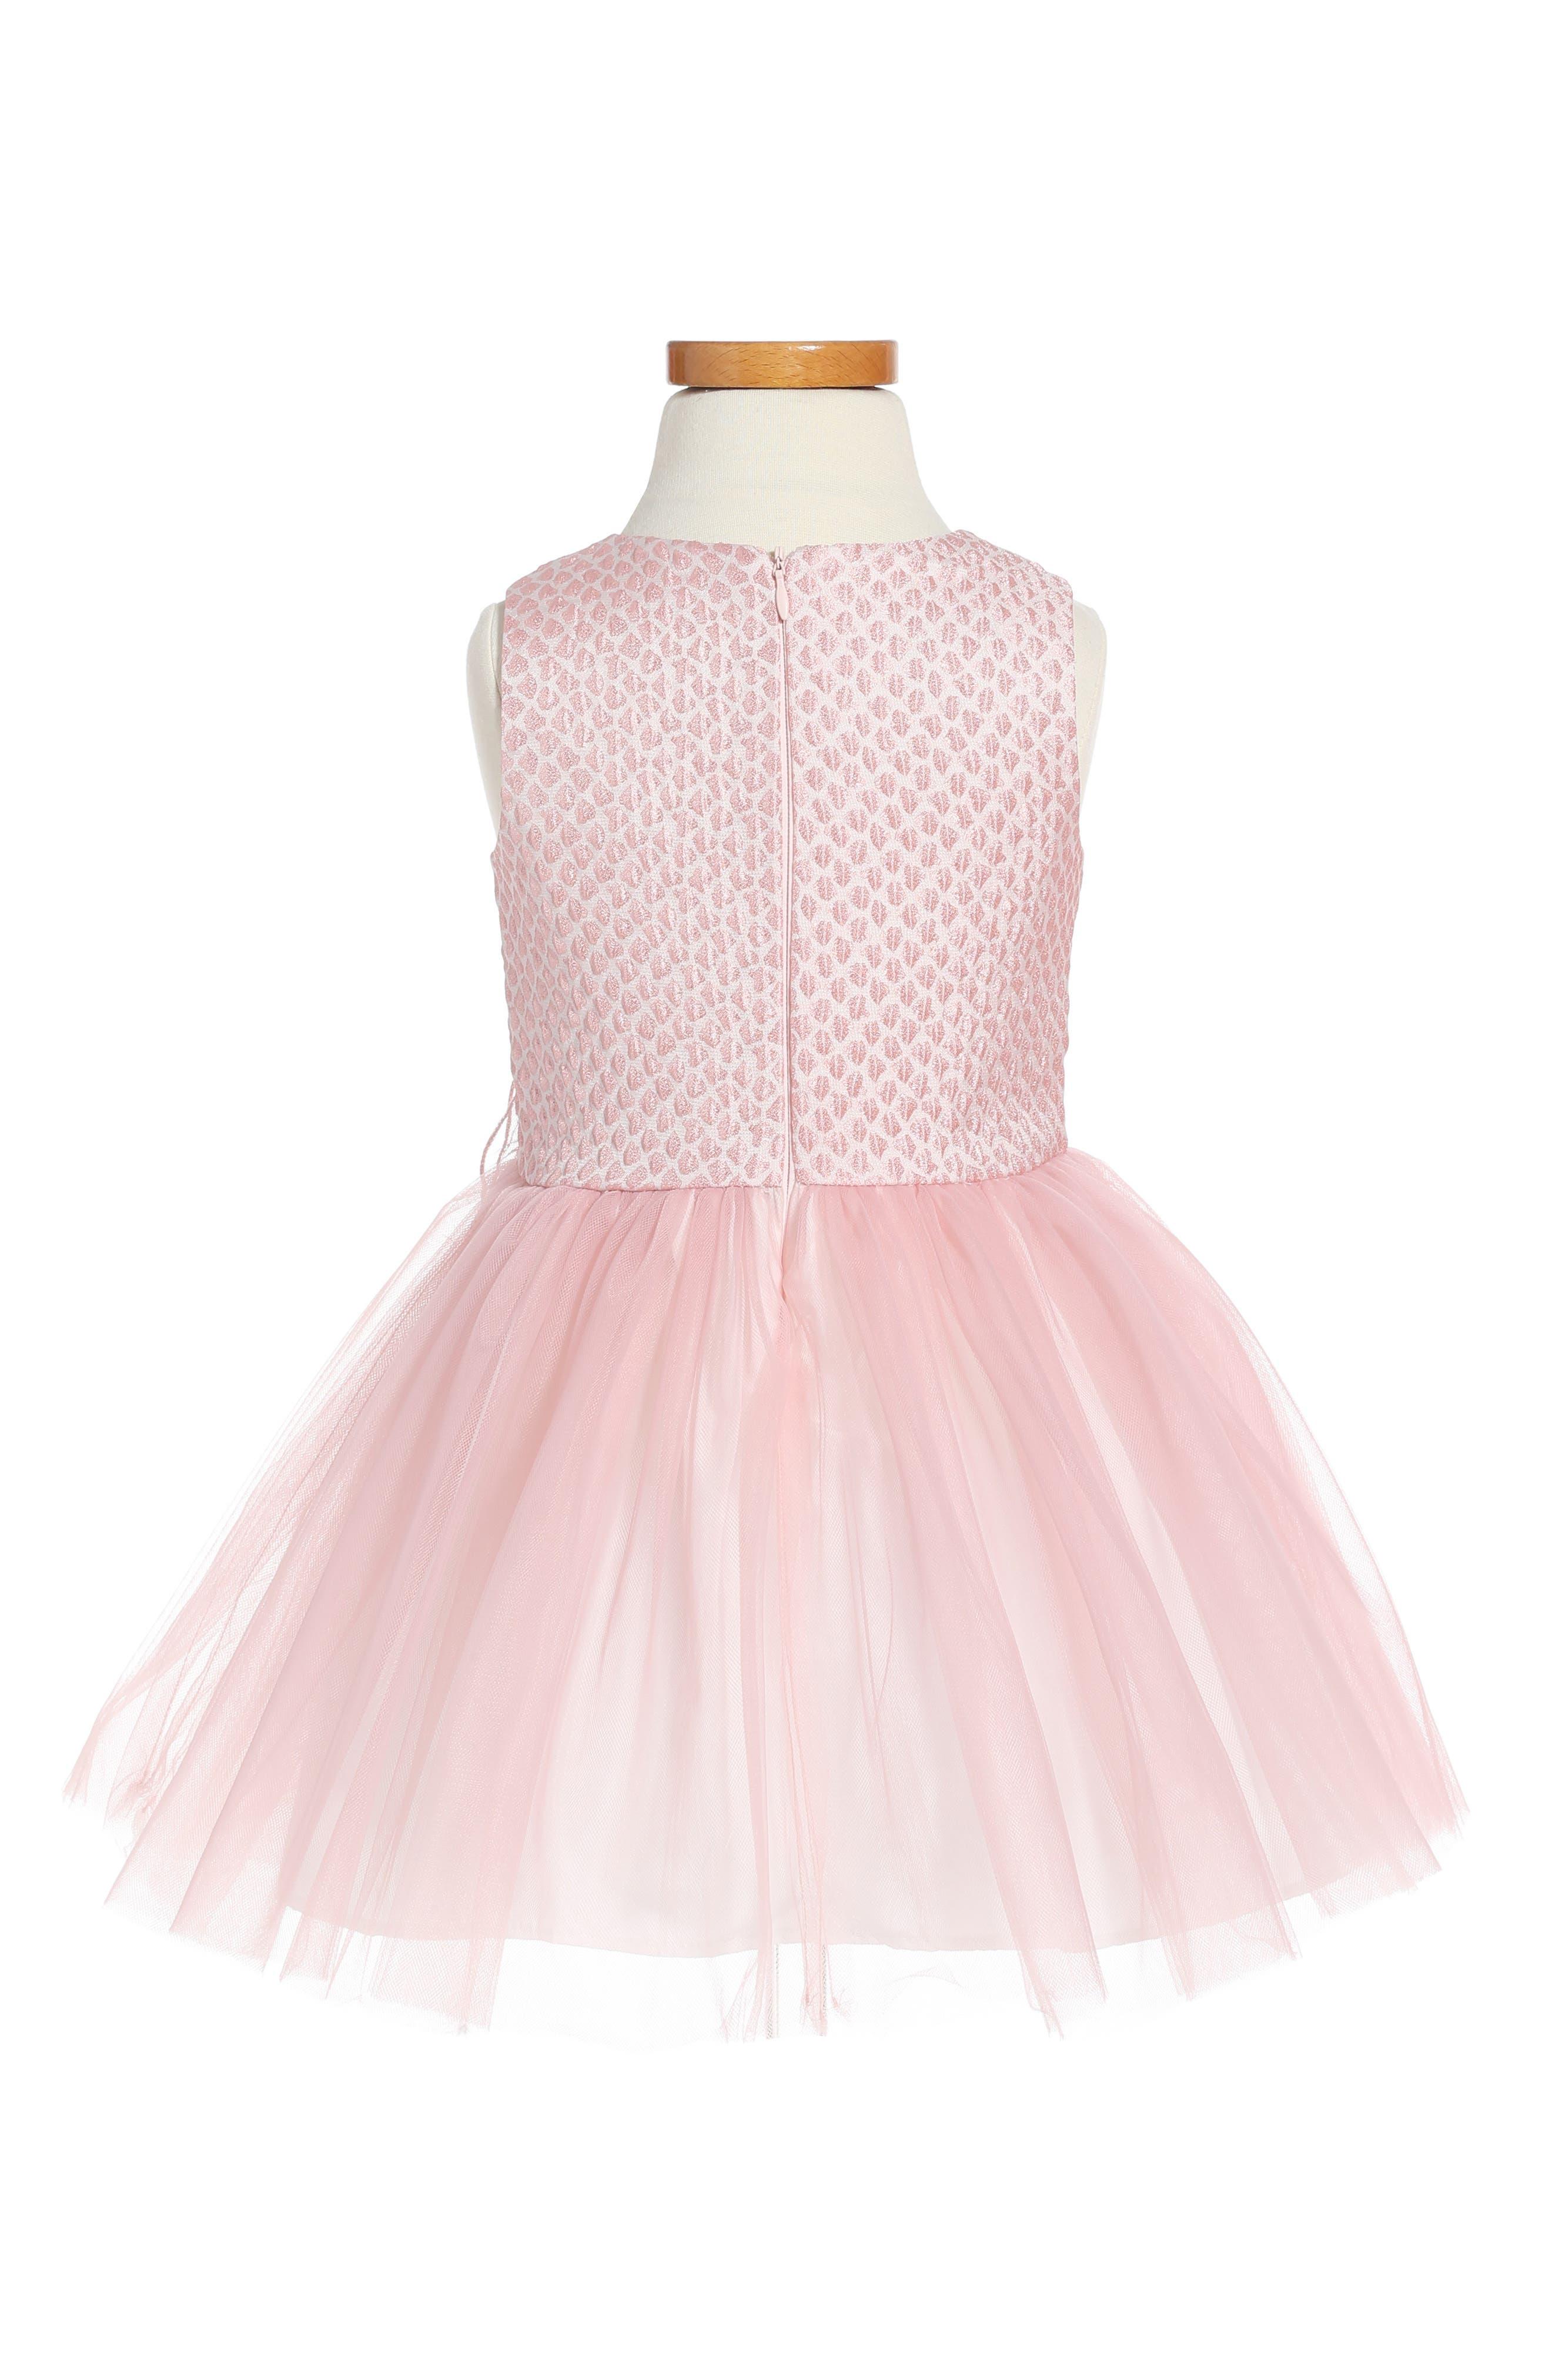 Brocade & Tulle Dress,                             Alternate thumbnail 2, color,                             650